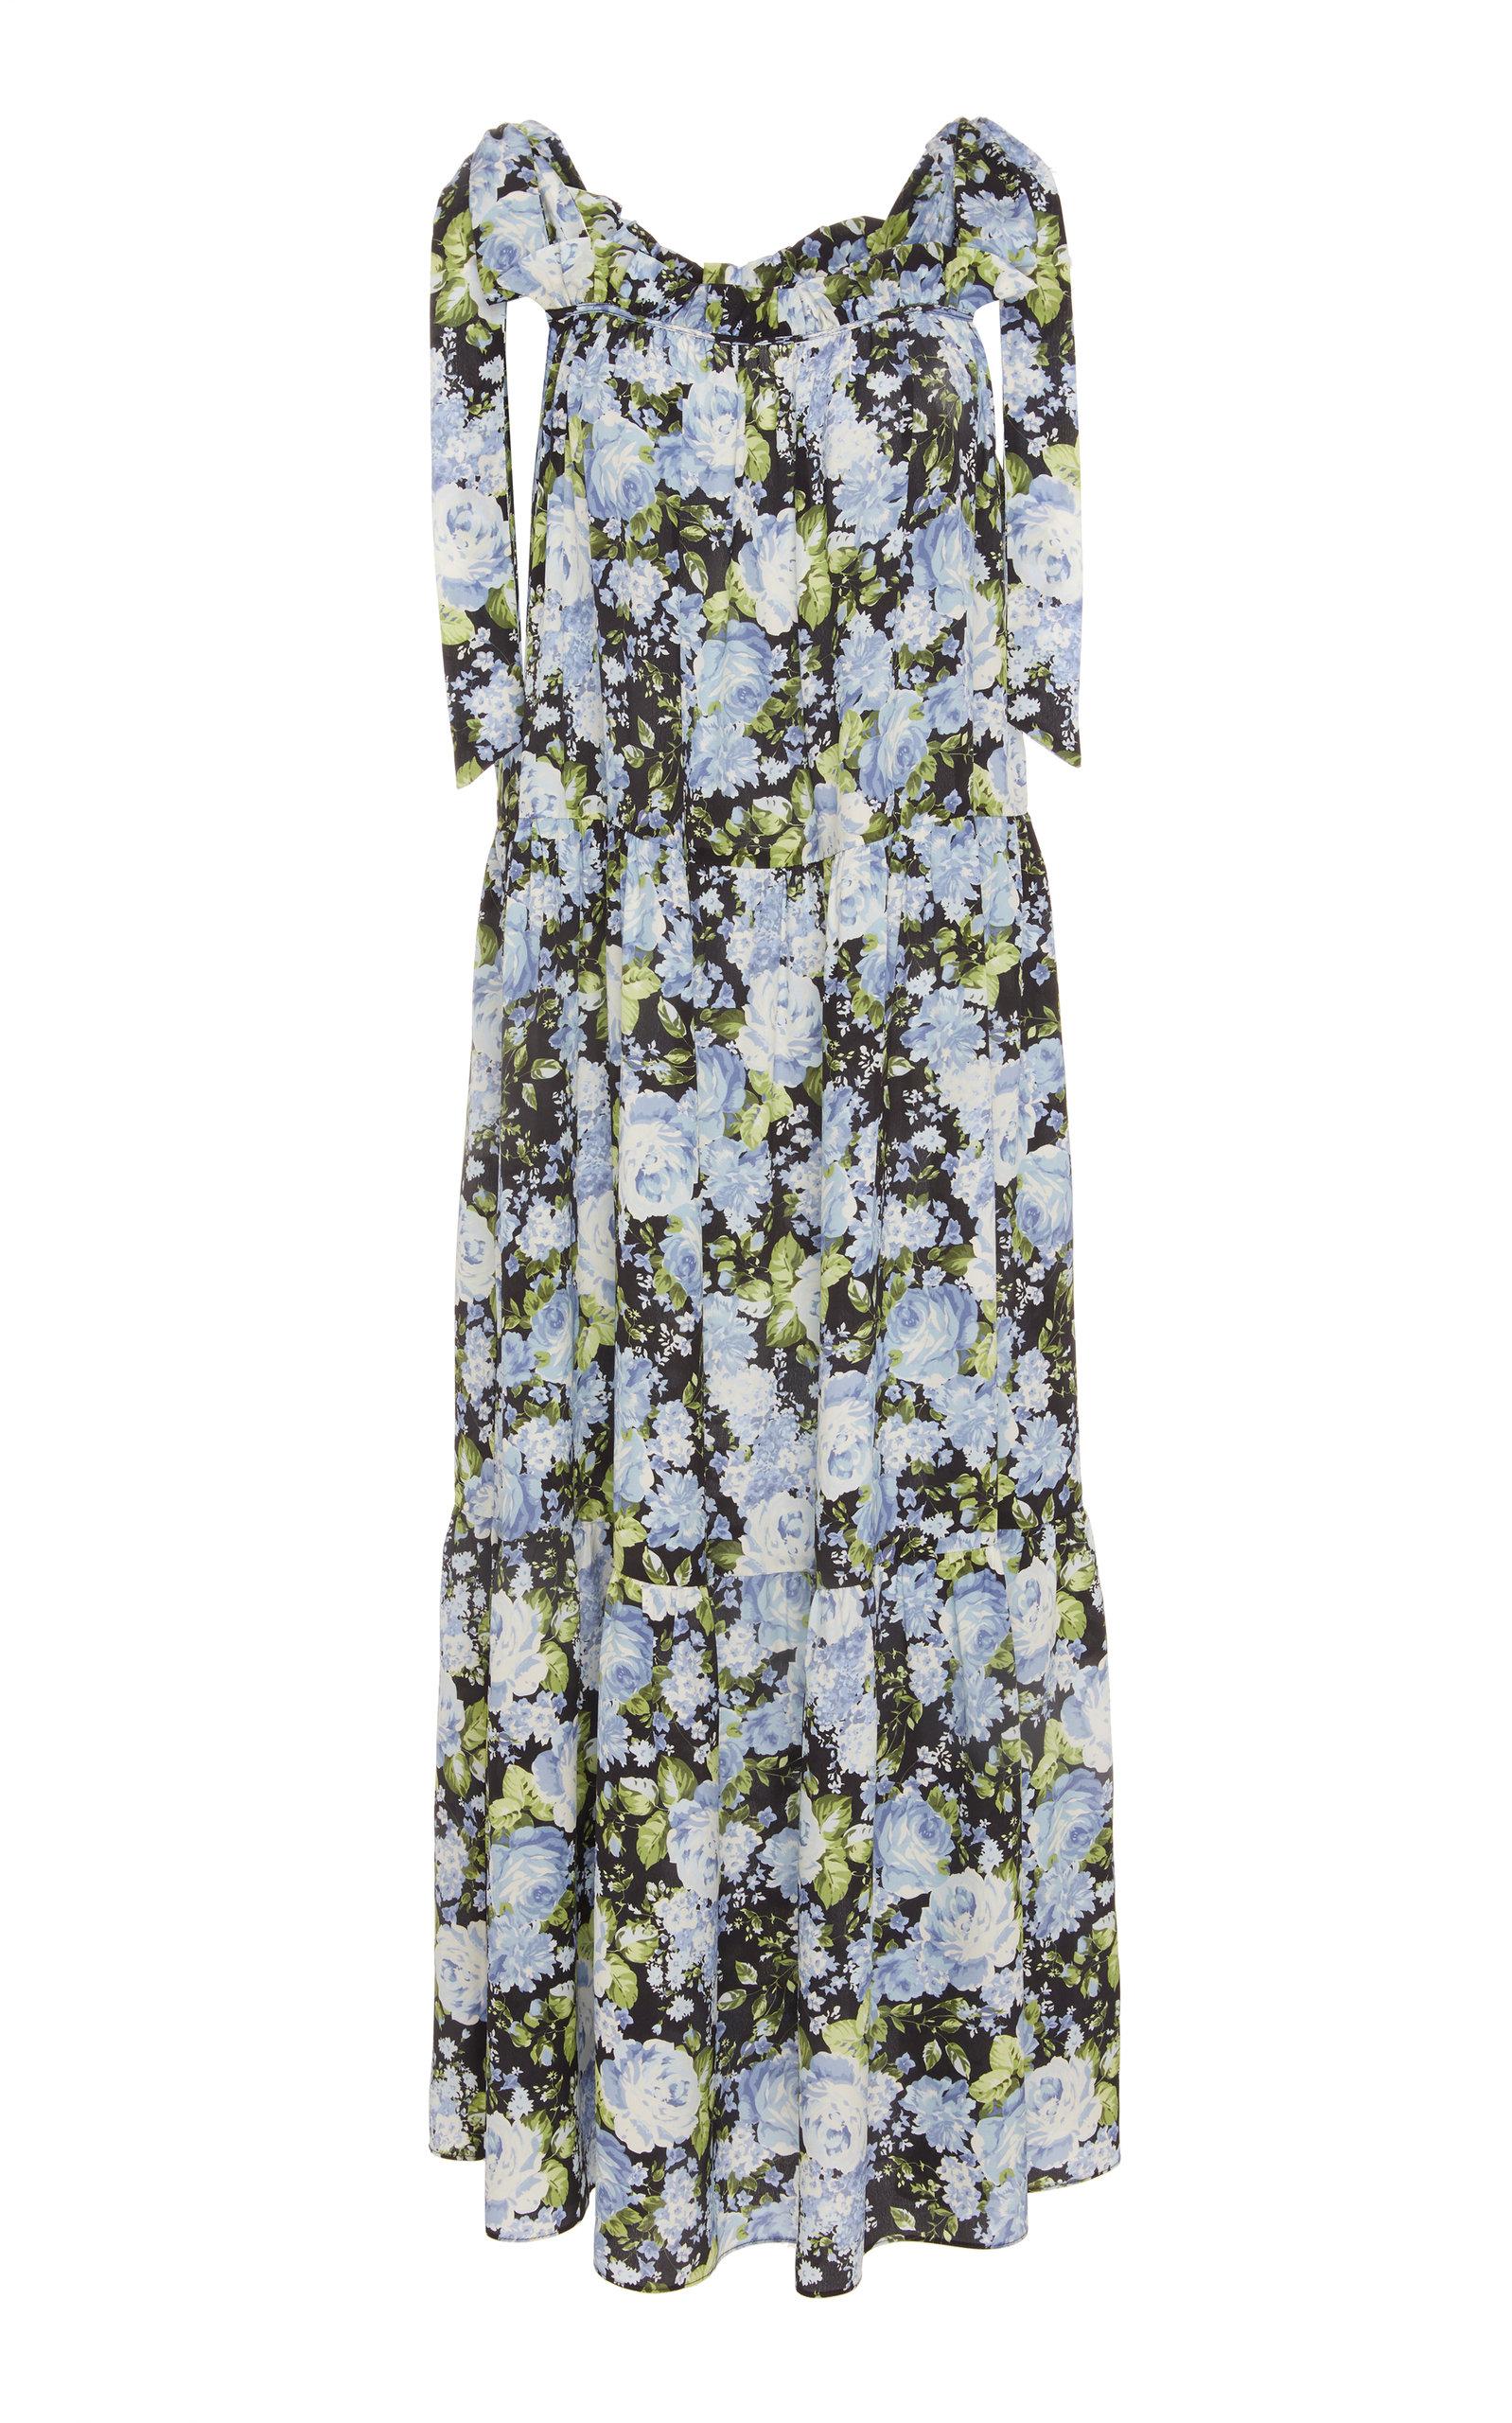 LES RÊVERIES Tie-Strap Tiered Crepe De Chine Floral Dress in Black